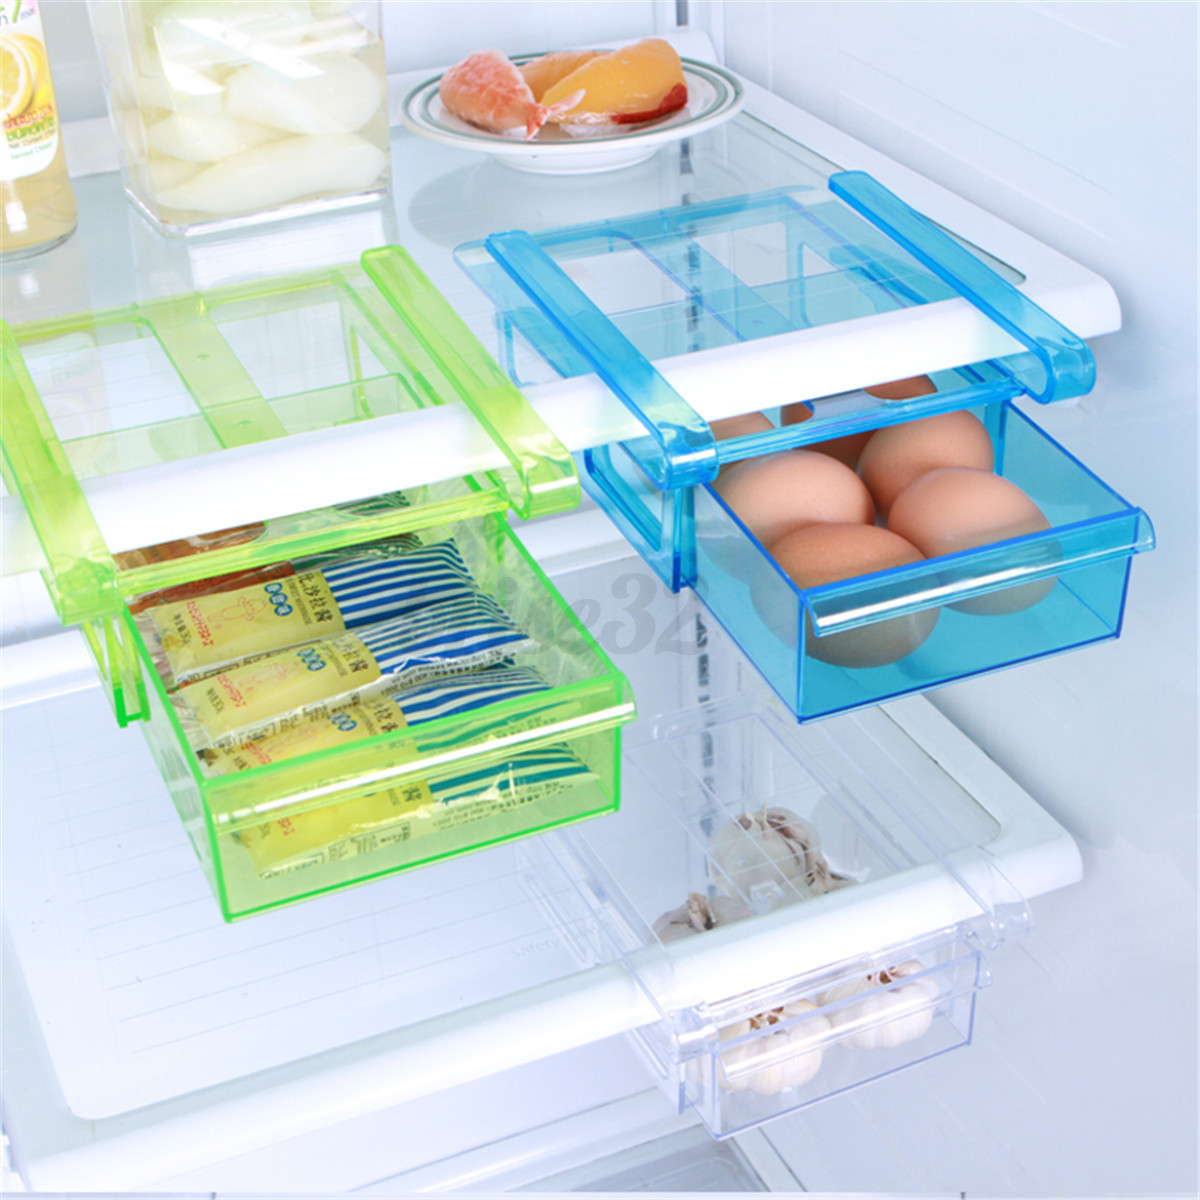 Kitchen Shelf Holders: Plastic Kitchen Freezer Fridge Drawer Storage Rack Holder